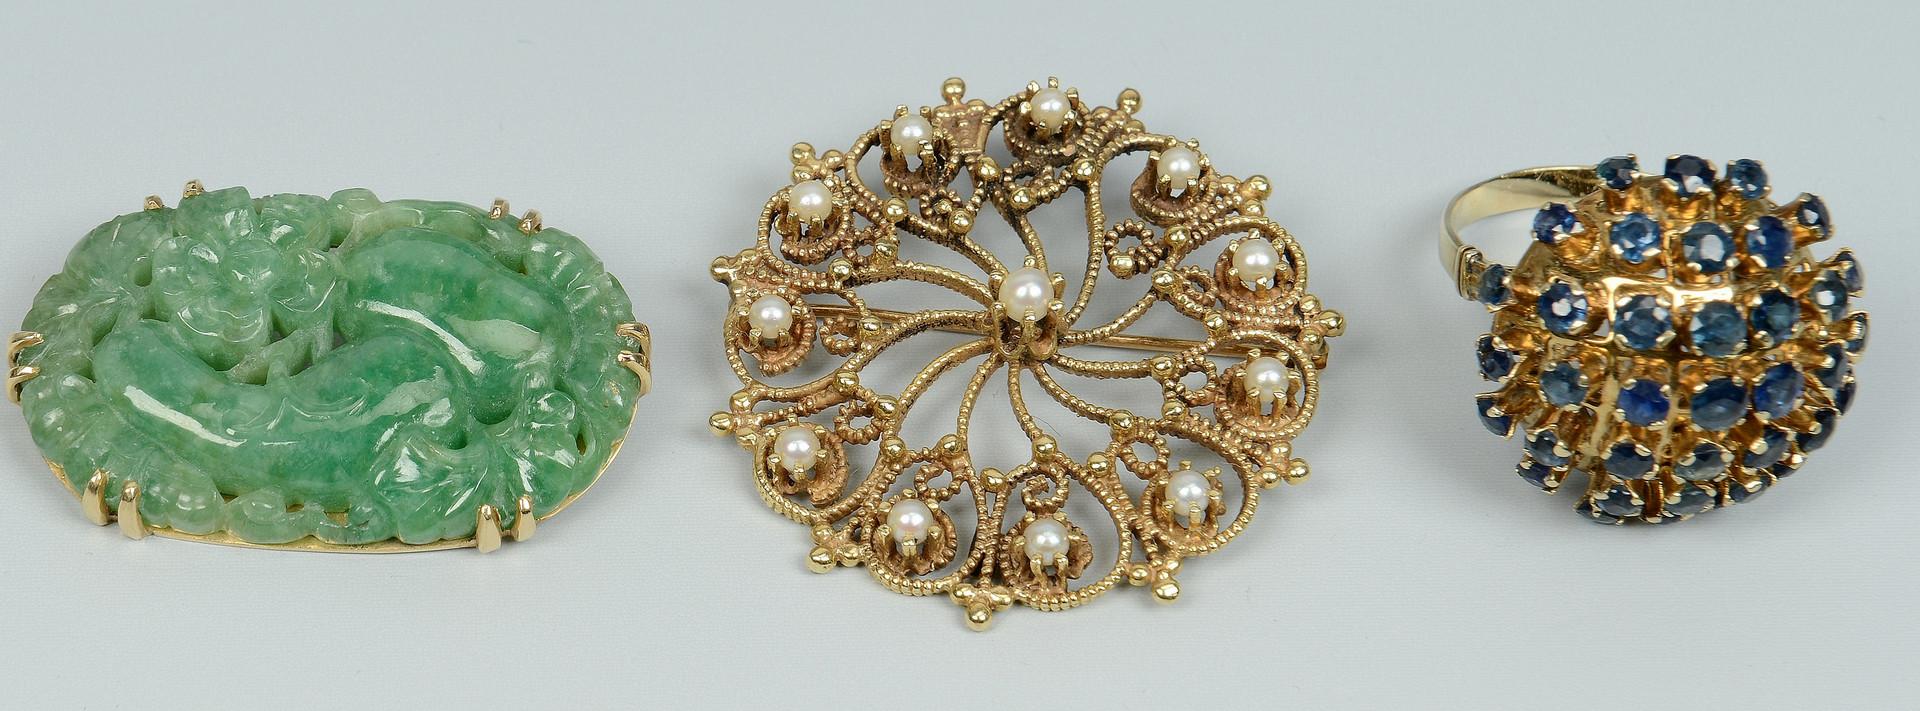 Lot 252: 3 14K items: jade & pearl pins, sapphire ring